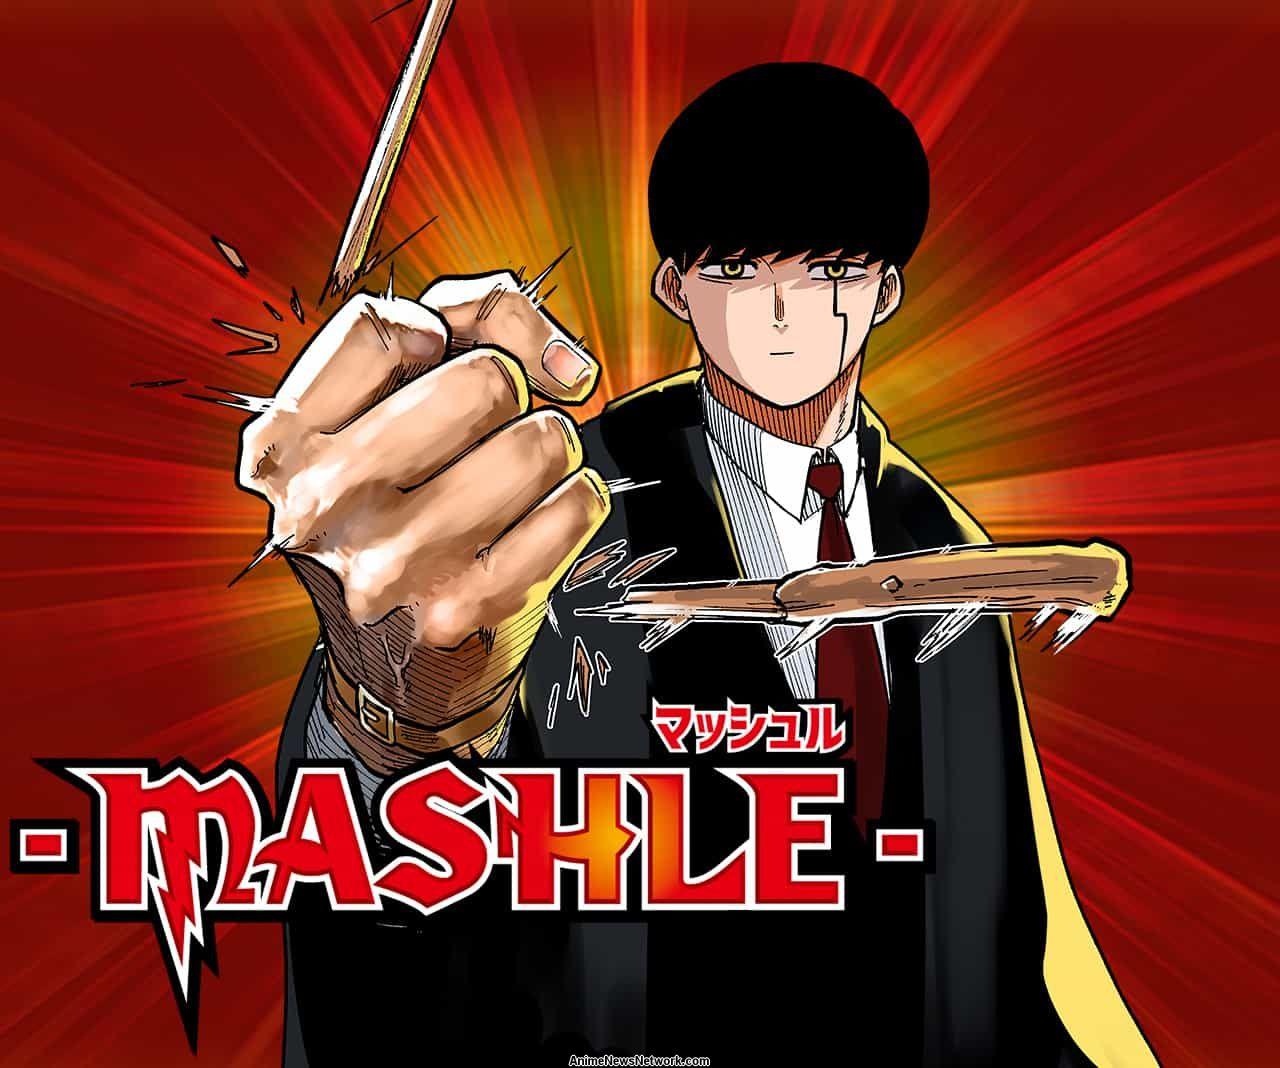 Mashle: Magic and Muscles (manga) - Anime News Network